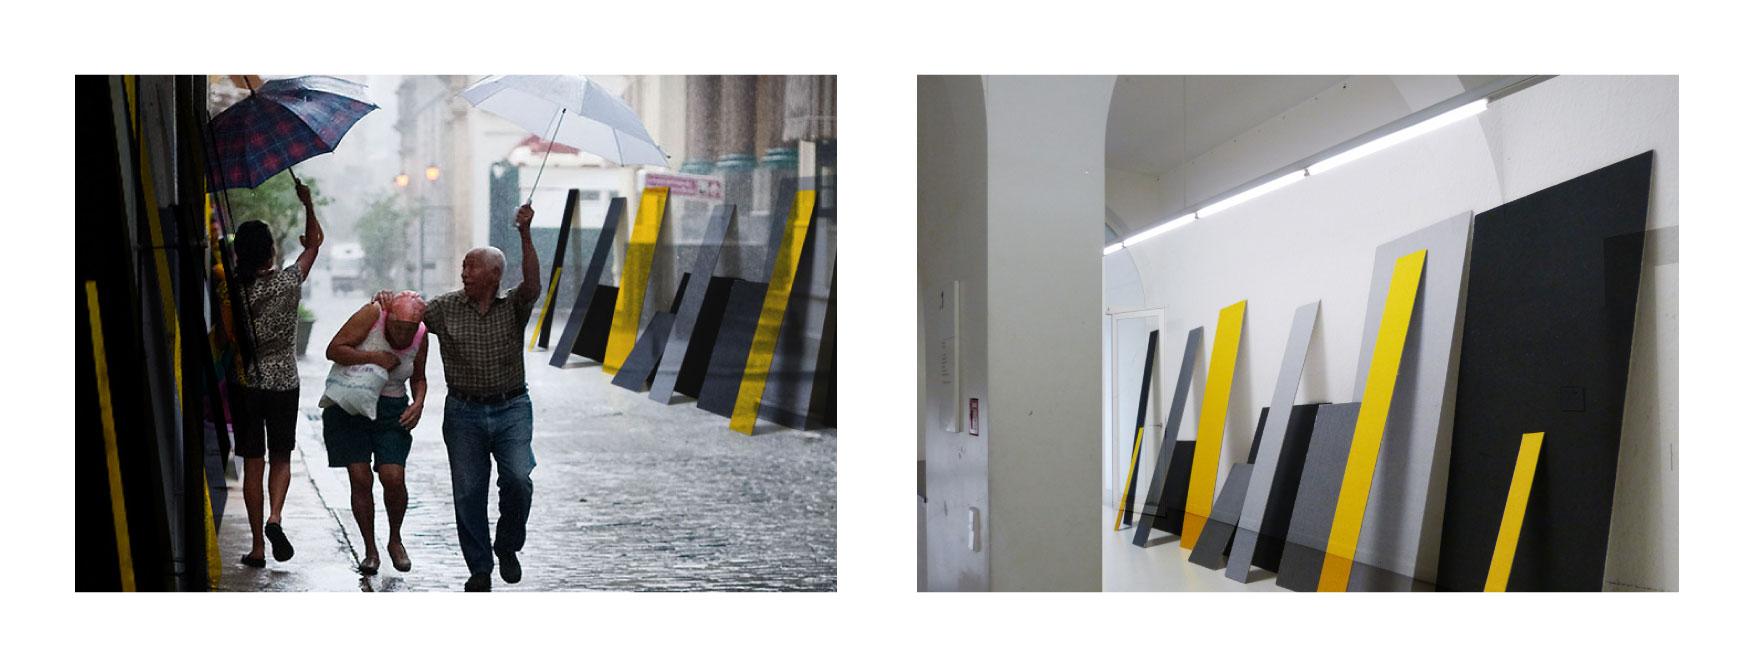 gerrit_schweiger-Nice_to_have-Must_have-unreachable-Accessoire-Accessory-Designprozess-Design_Thinking-Social_Design-Ausstellung-CAD-Raum-Illustration-Skulptur-Plakat-Marke-Typographie-Intervention-32